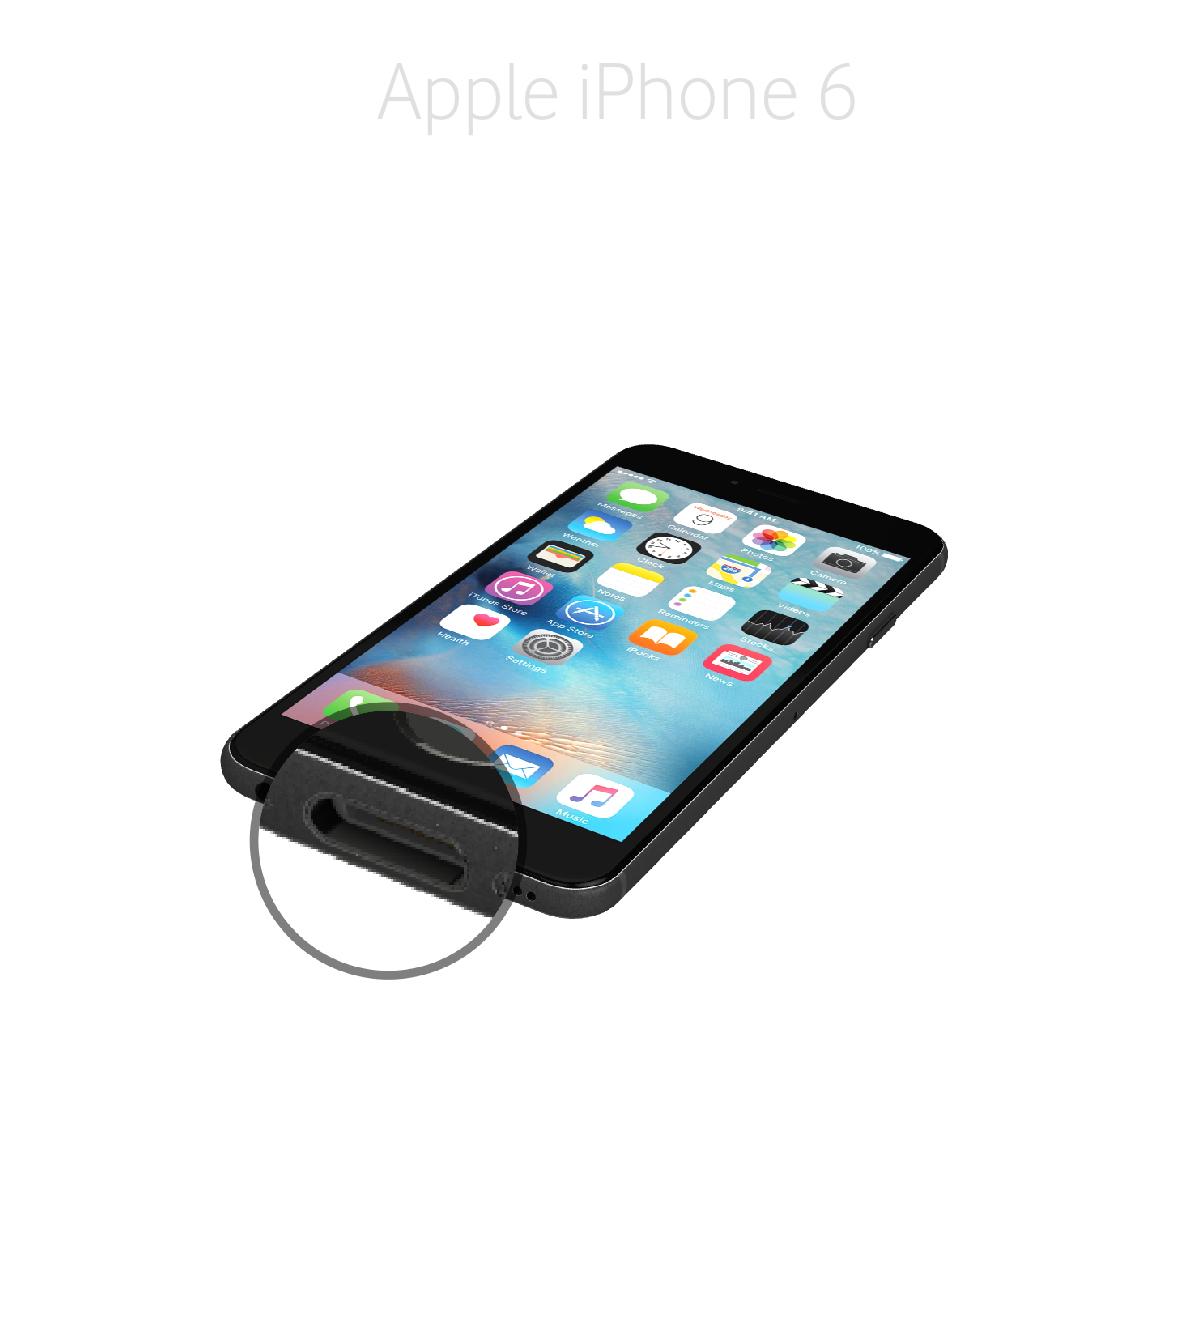 Laga lightningkontakt iPhone 6